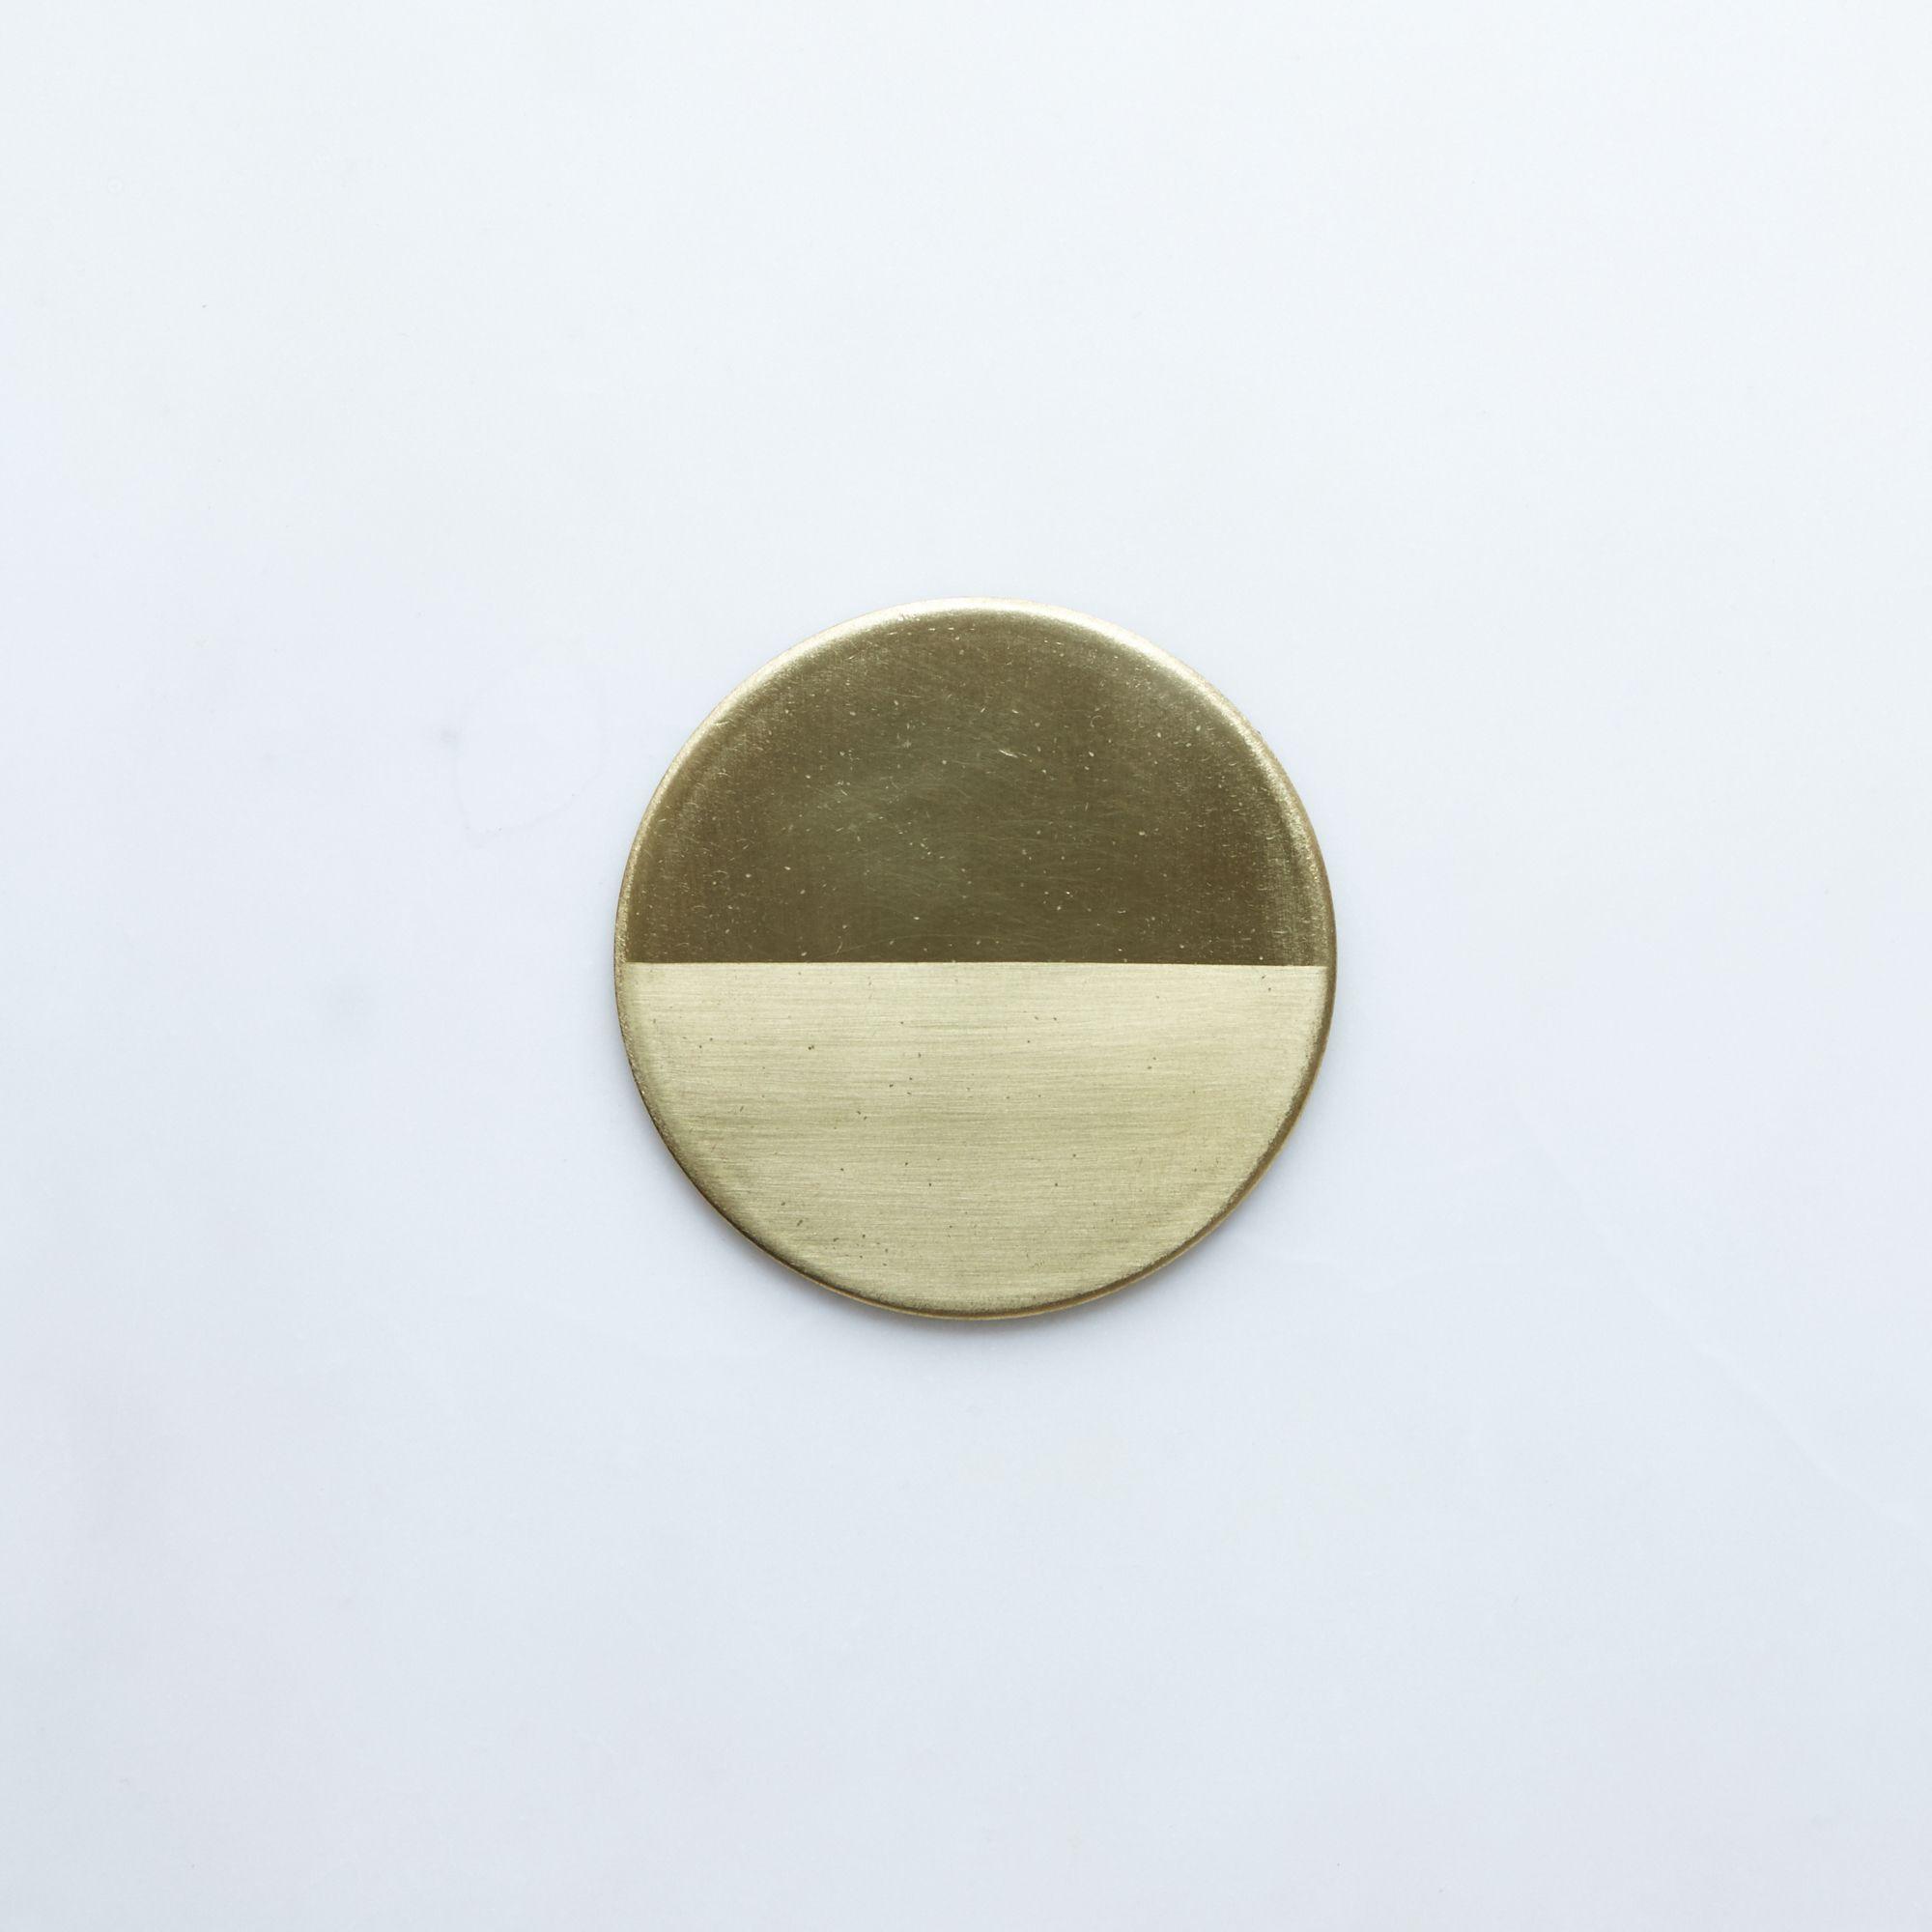 1f8eec14 a0f6 11e5 a190 0ef7535729df  2014 0522 kielmead brasscoasters semicircle silo 037